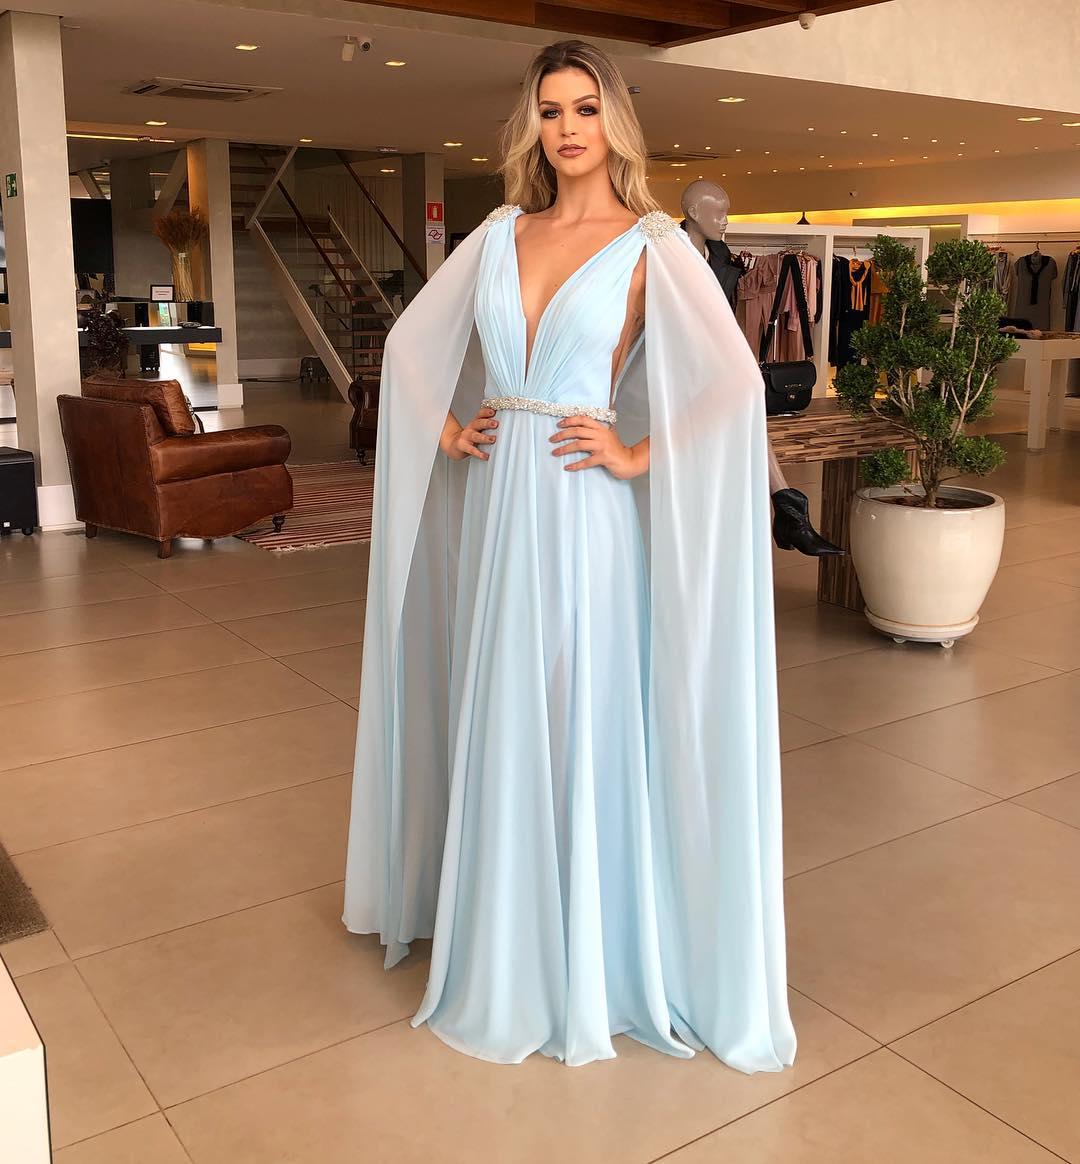 maria gabriela batistela, miss brasil terra 2019. - Página 5 52848213